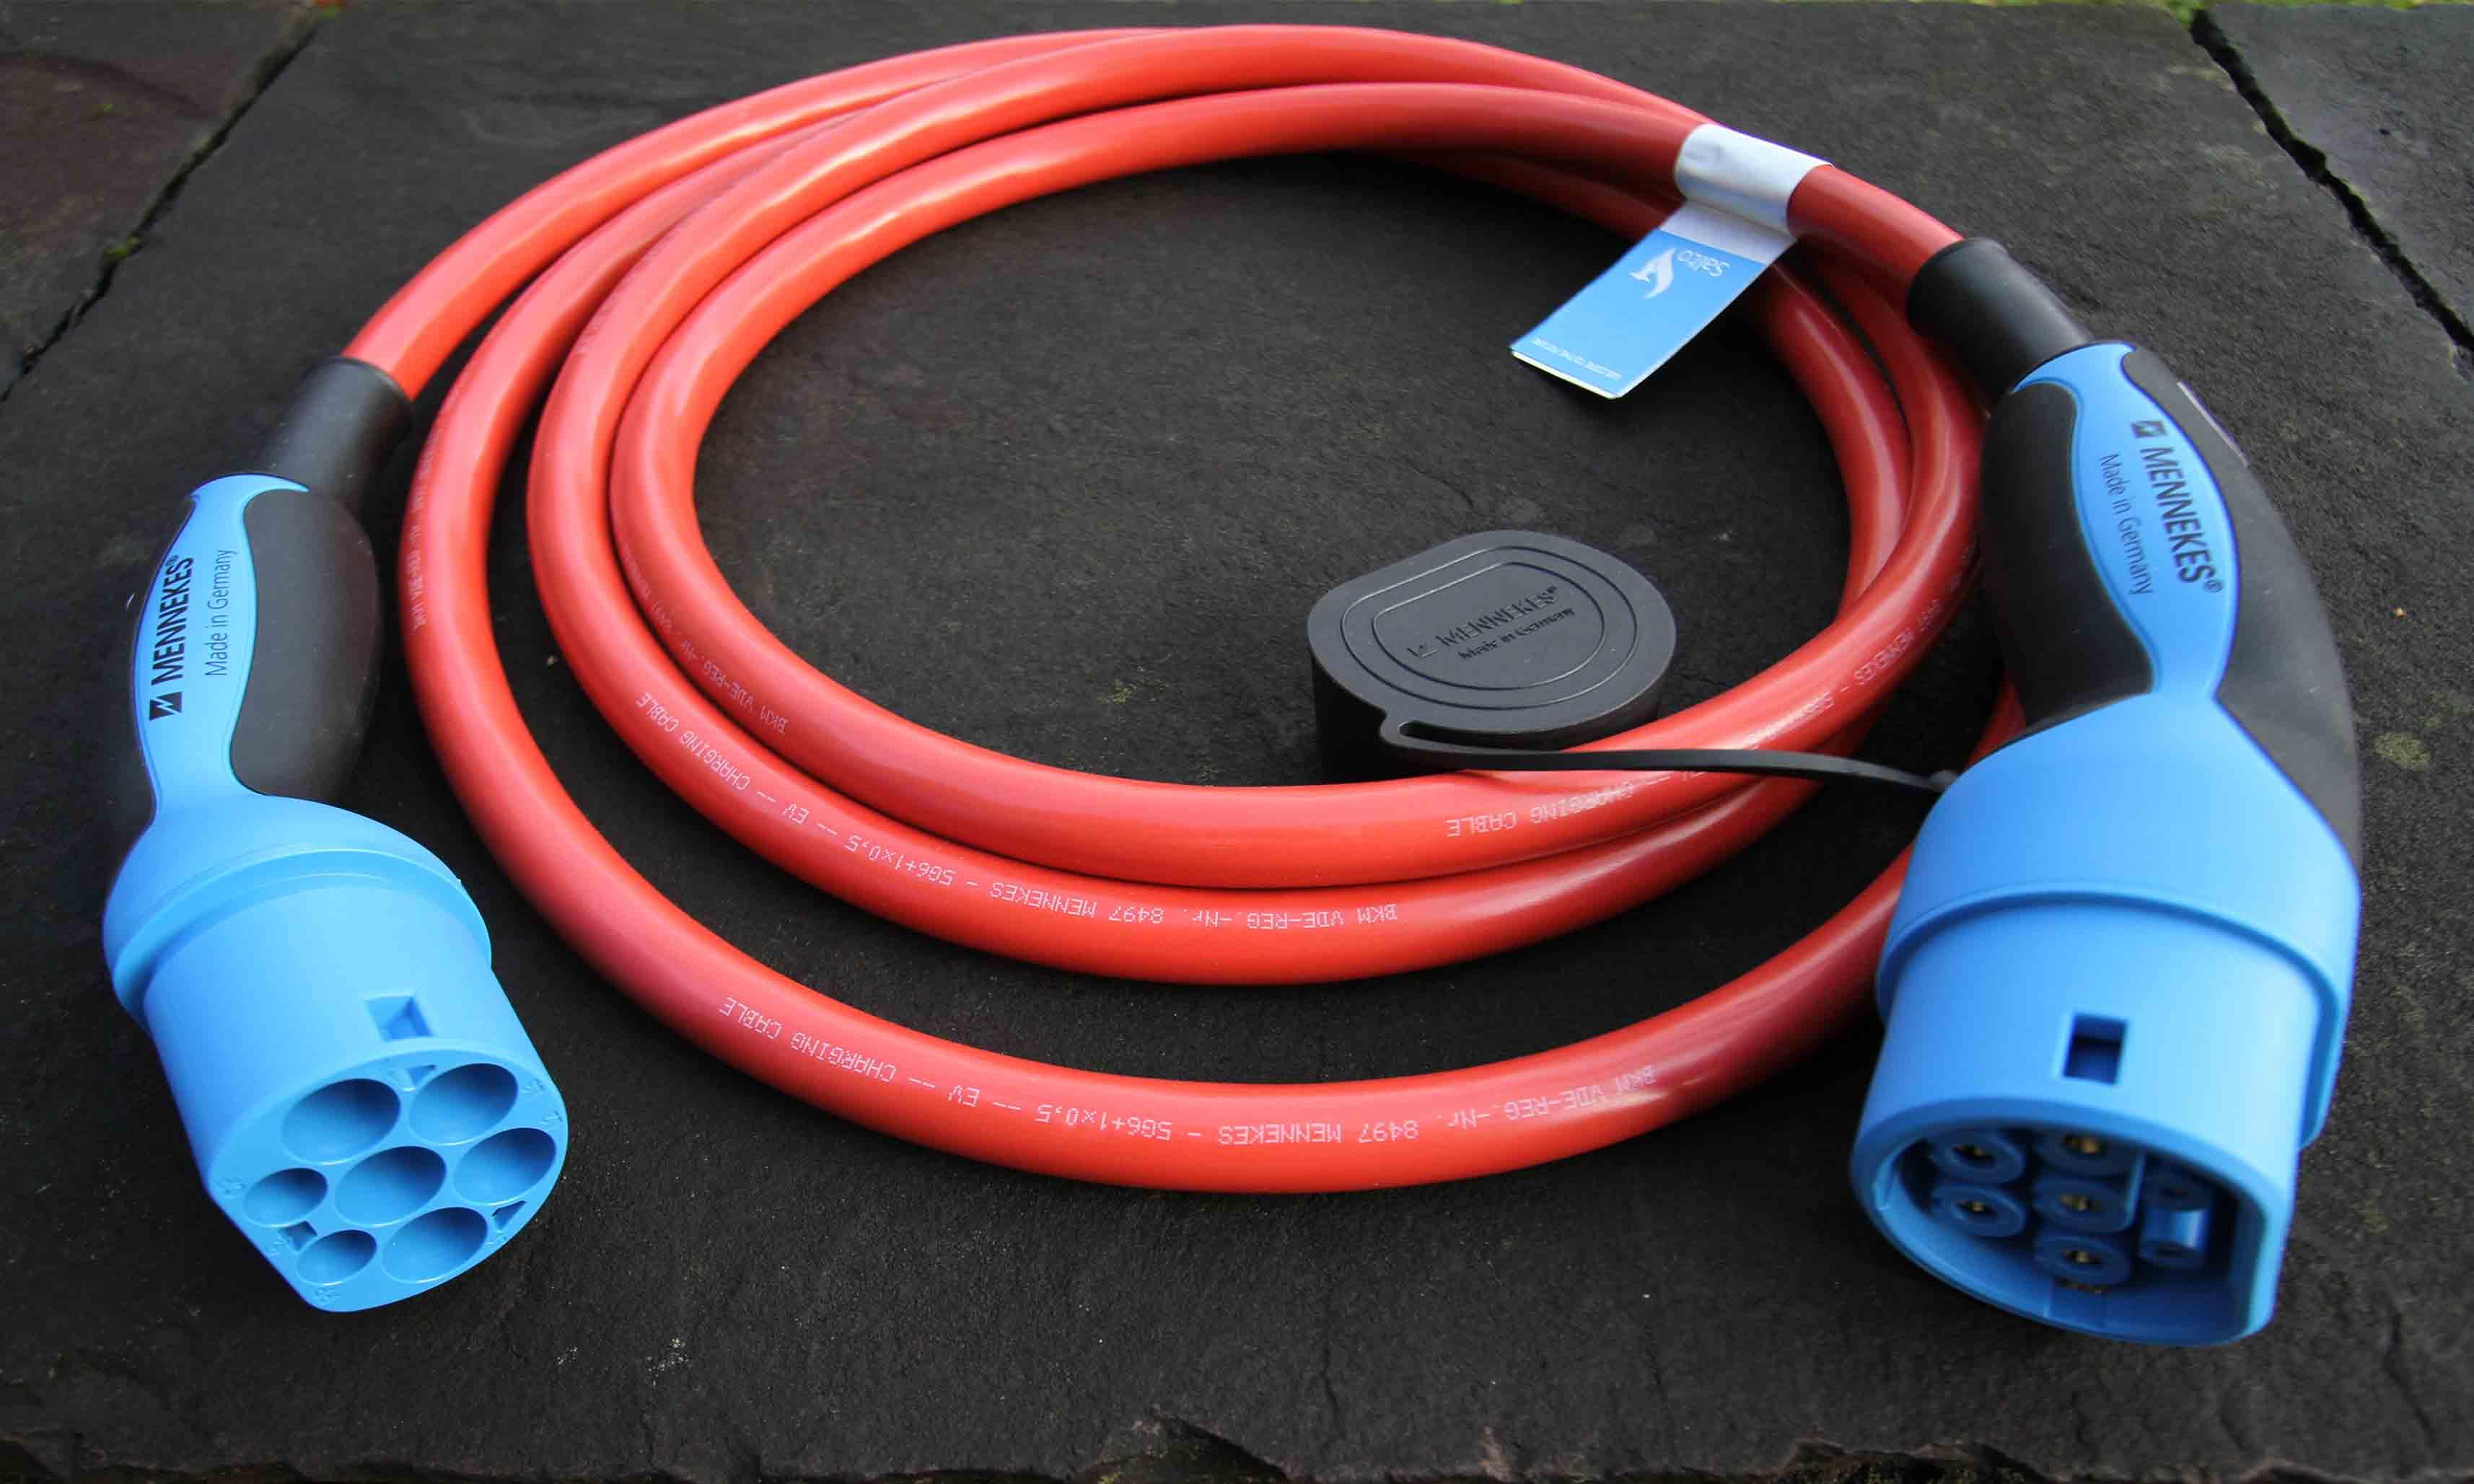 blogg 20130311 artikkelserie type2 kabel 800